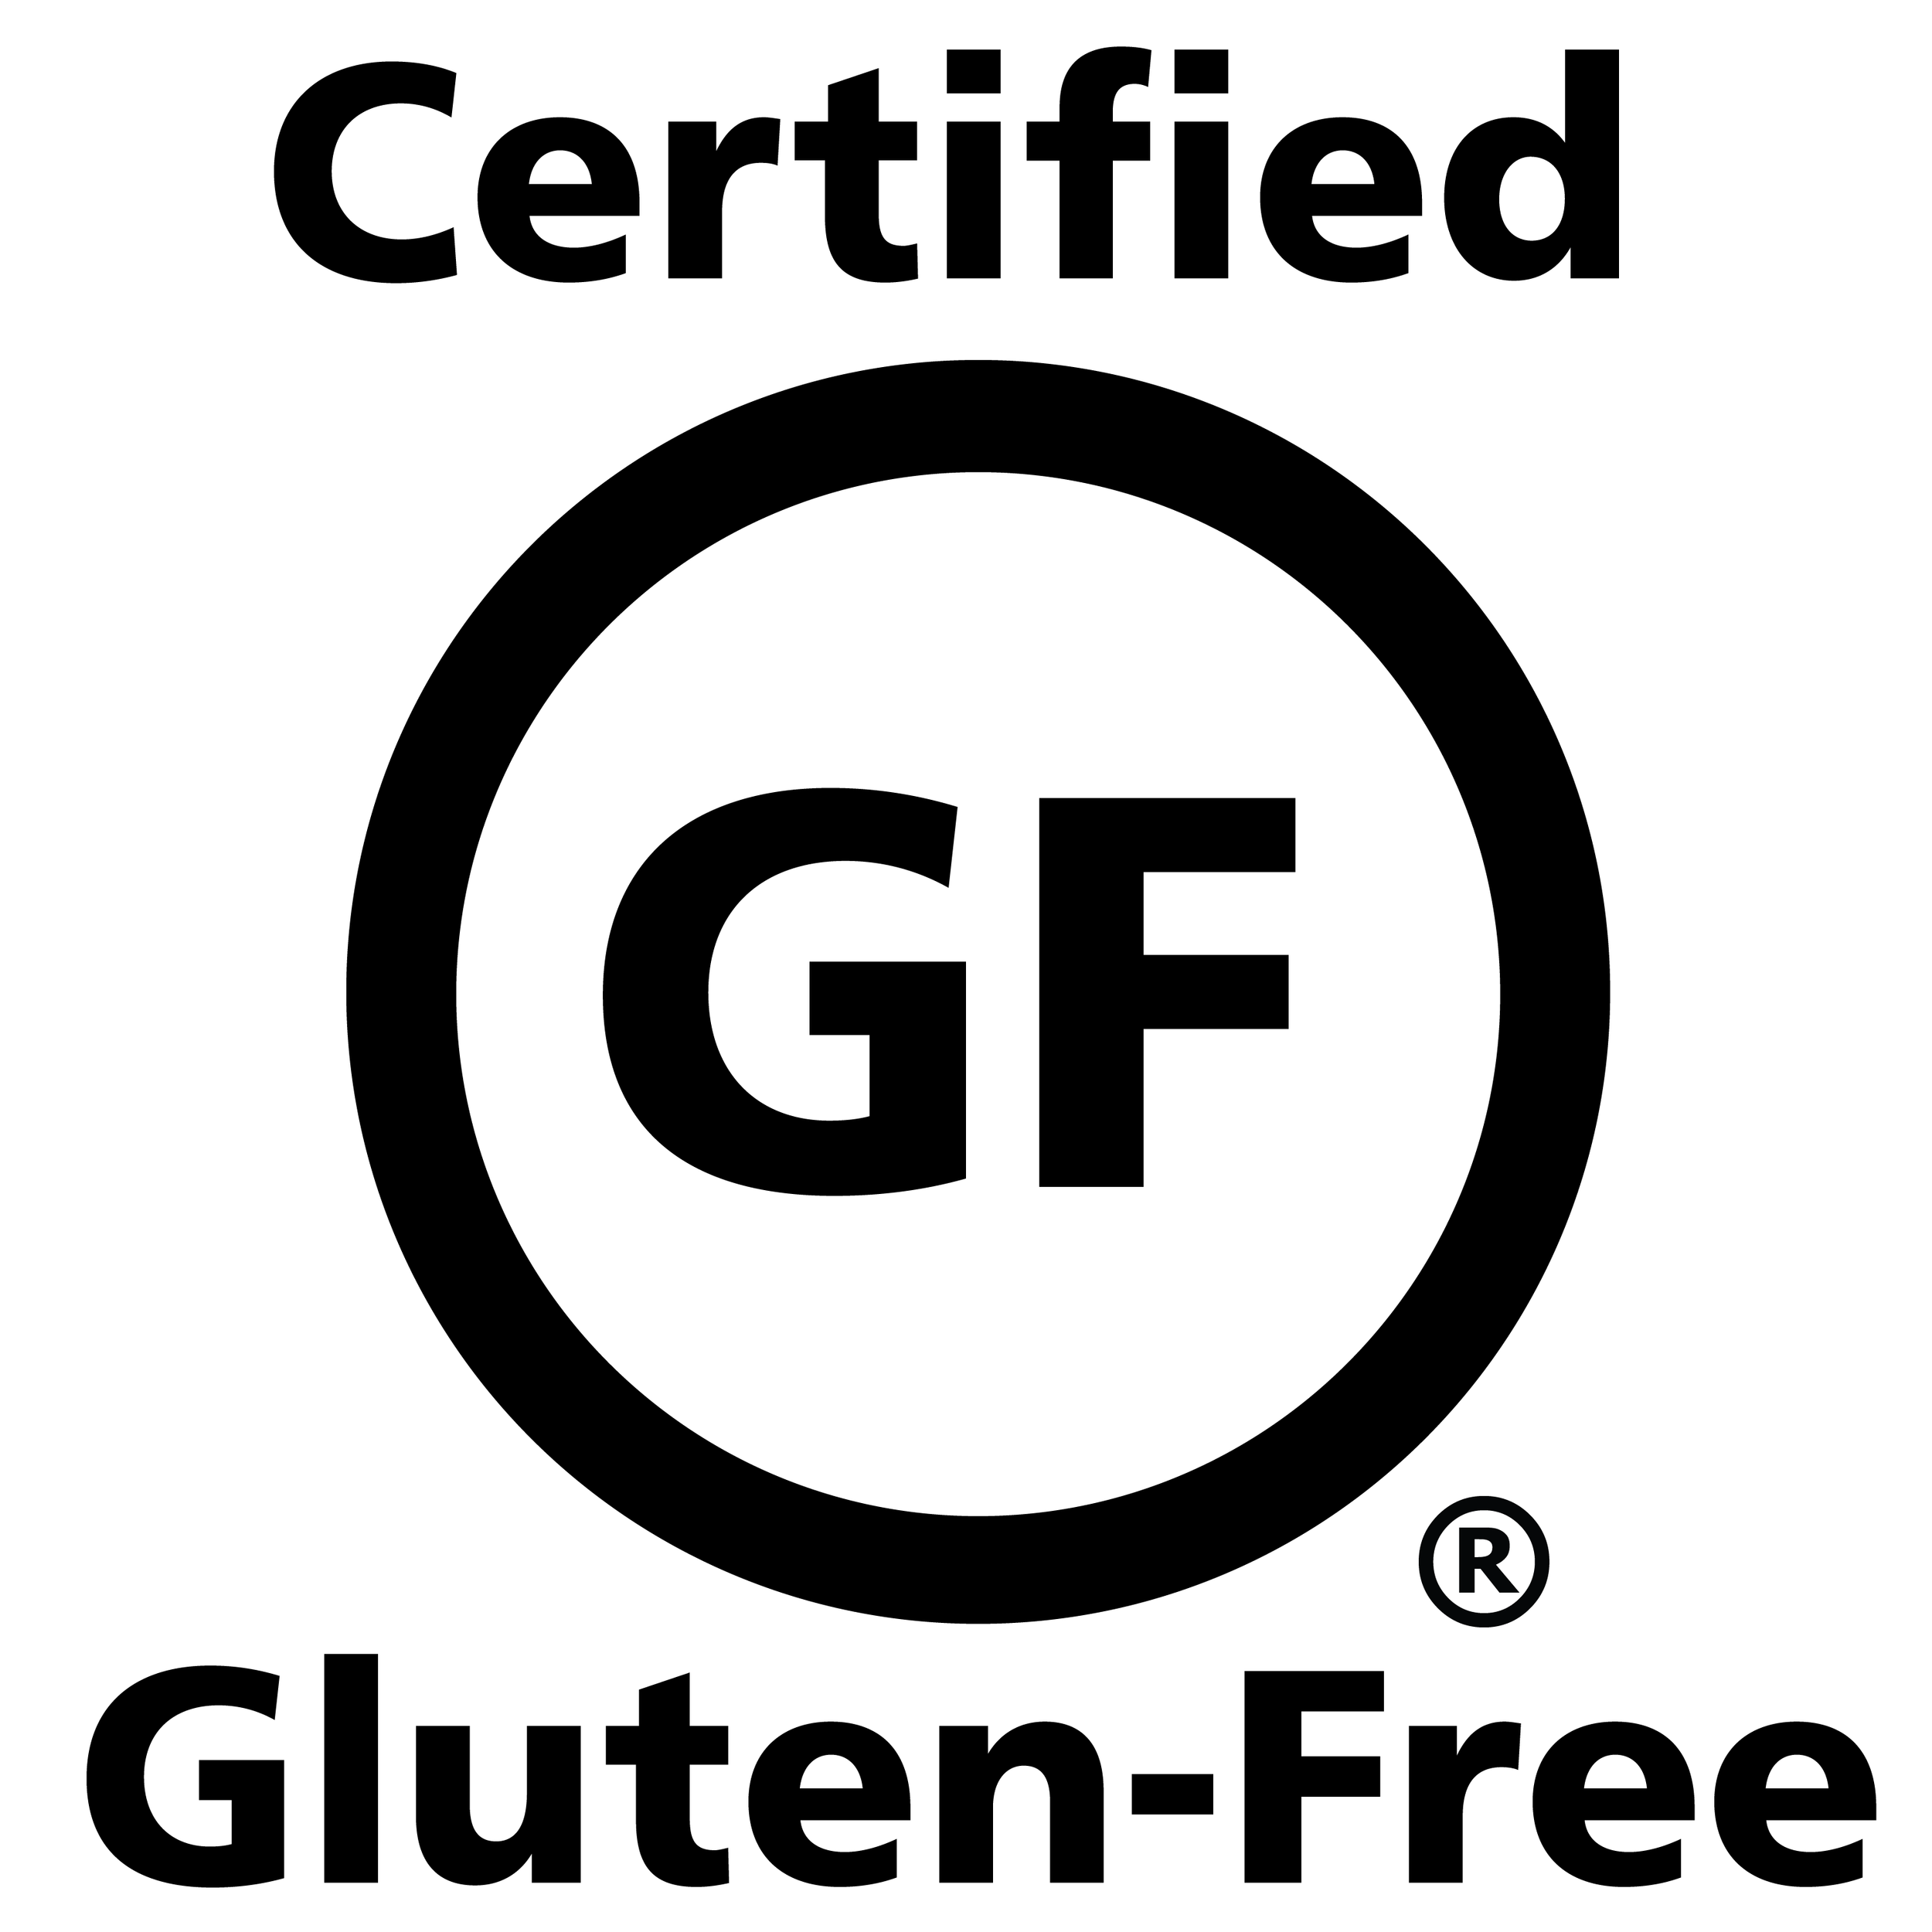 Certified-Gluten-Free-Logo-300-dpi-R.png